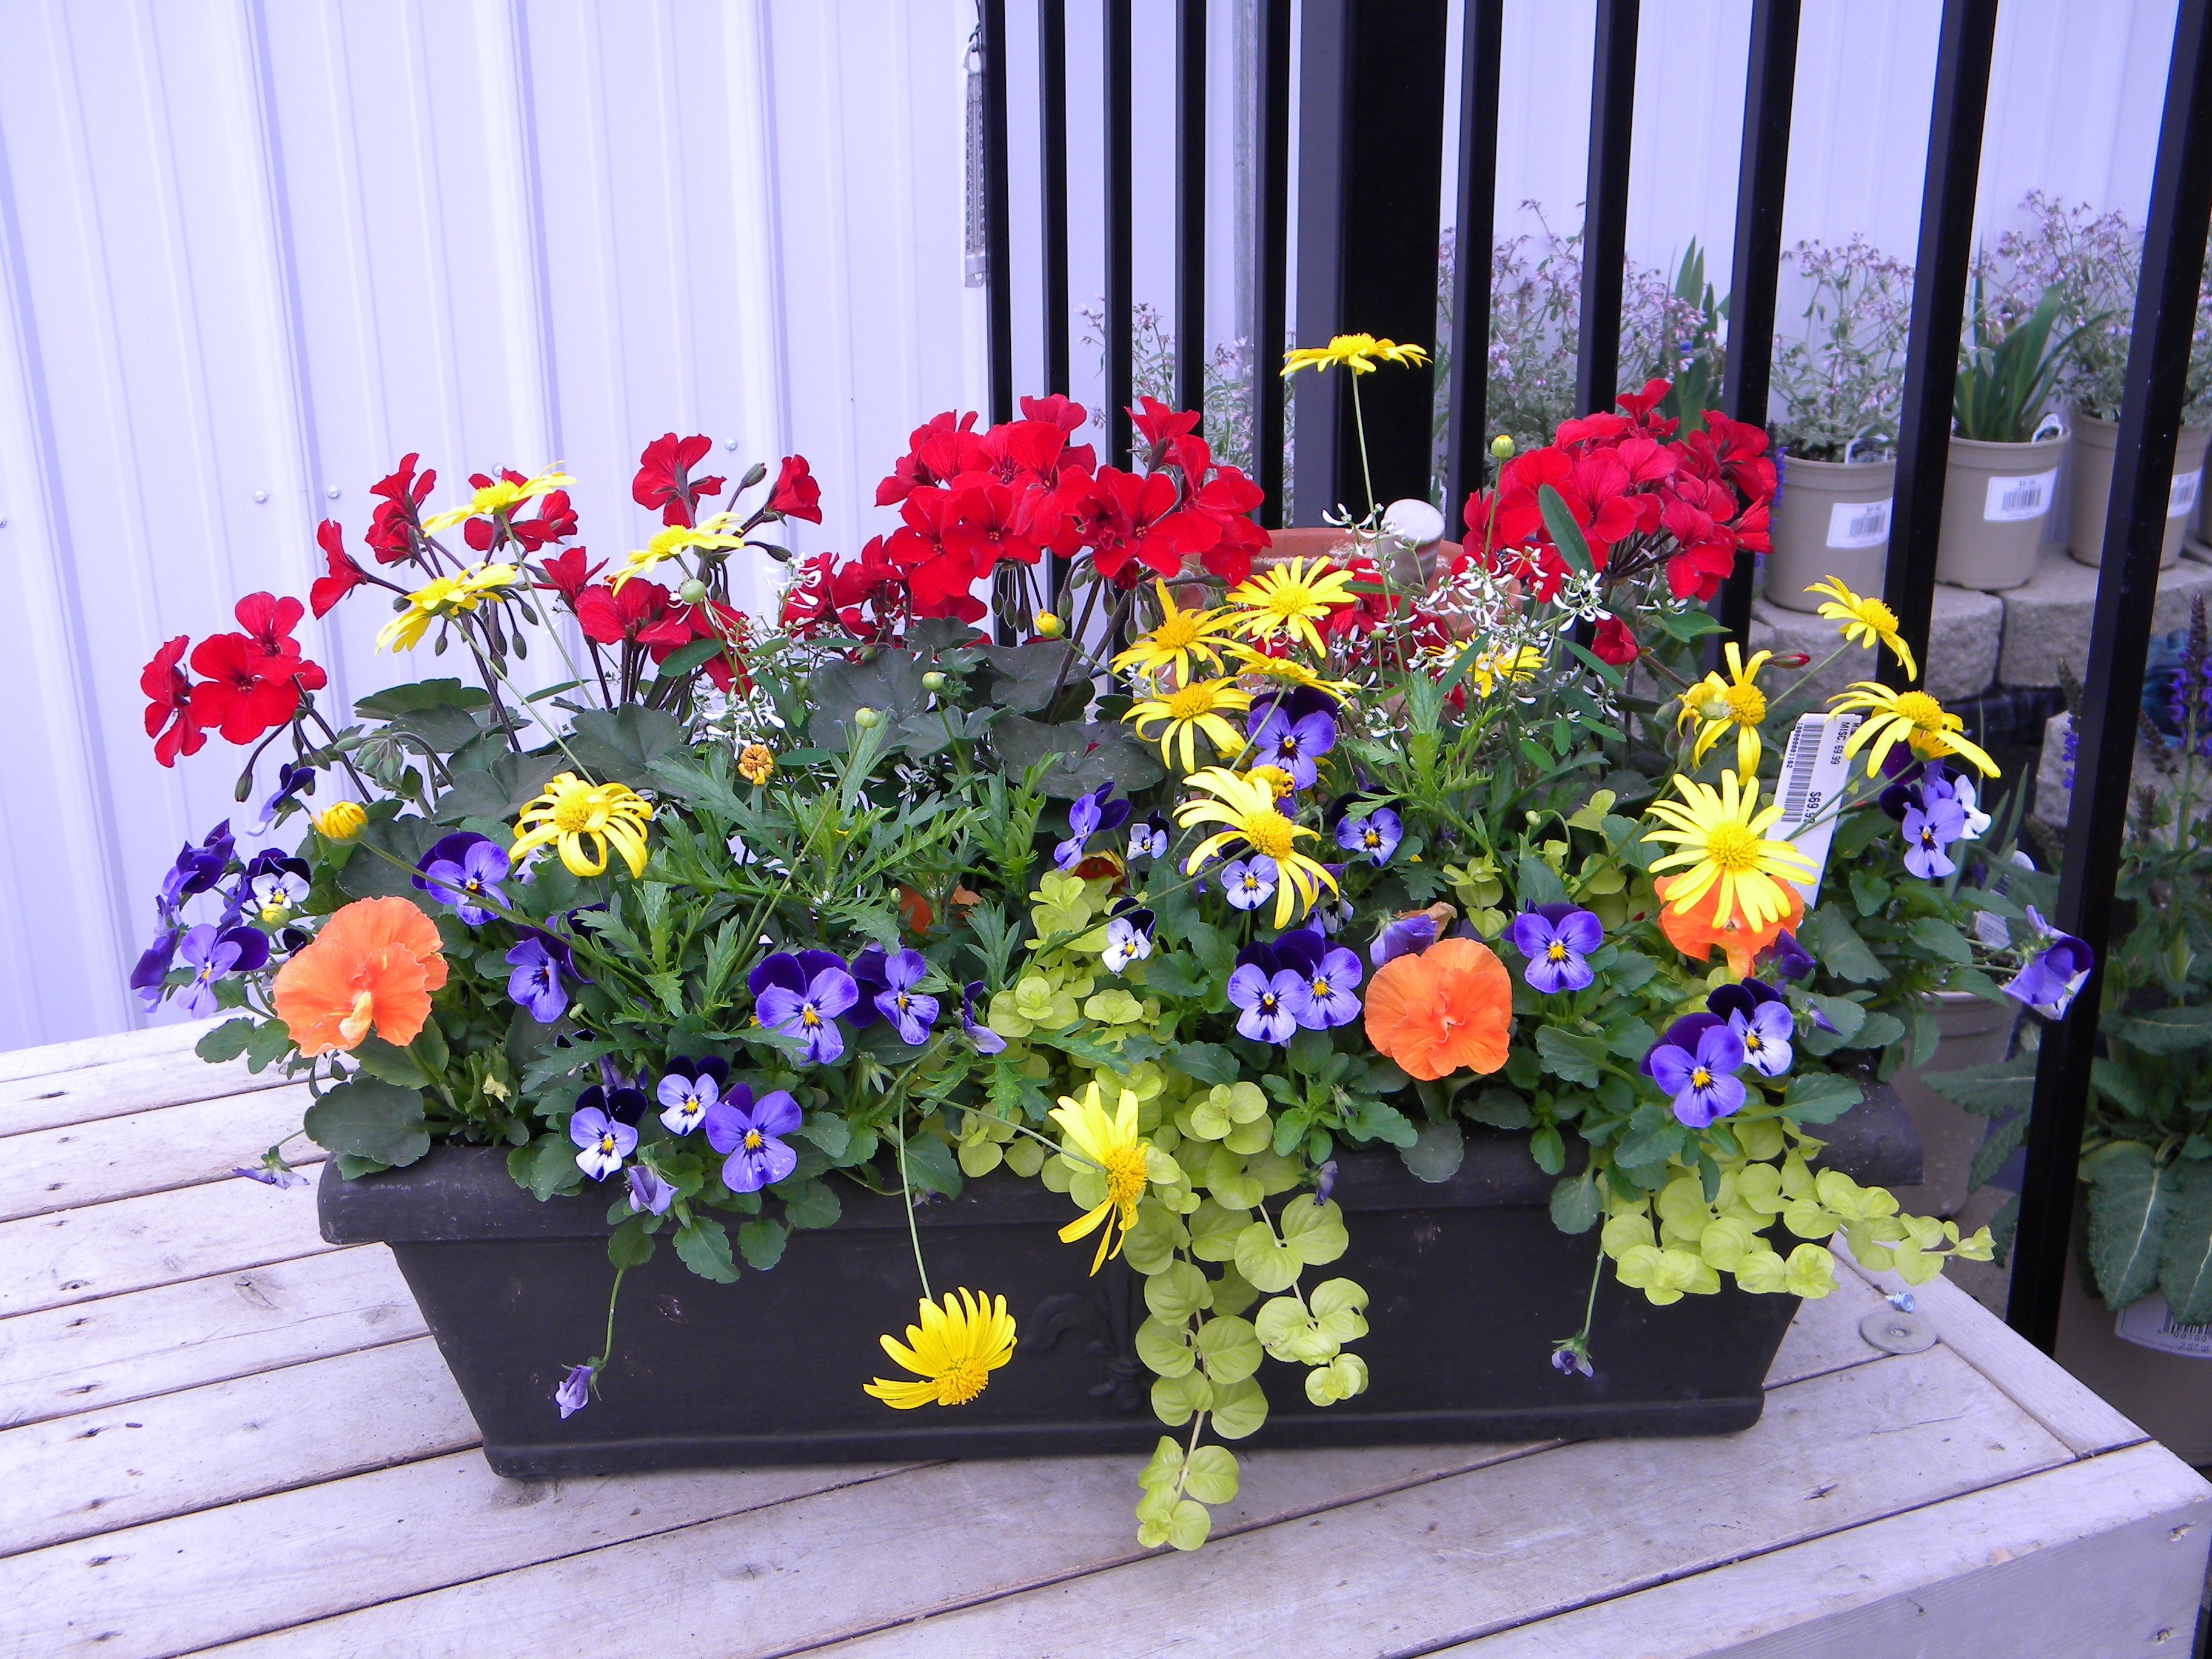 window box idea red caliente geraniums yellow euryops blue violas orange pansies - Patio Flower Boxes Ideas